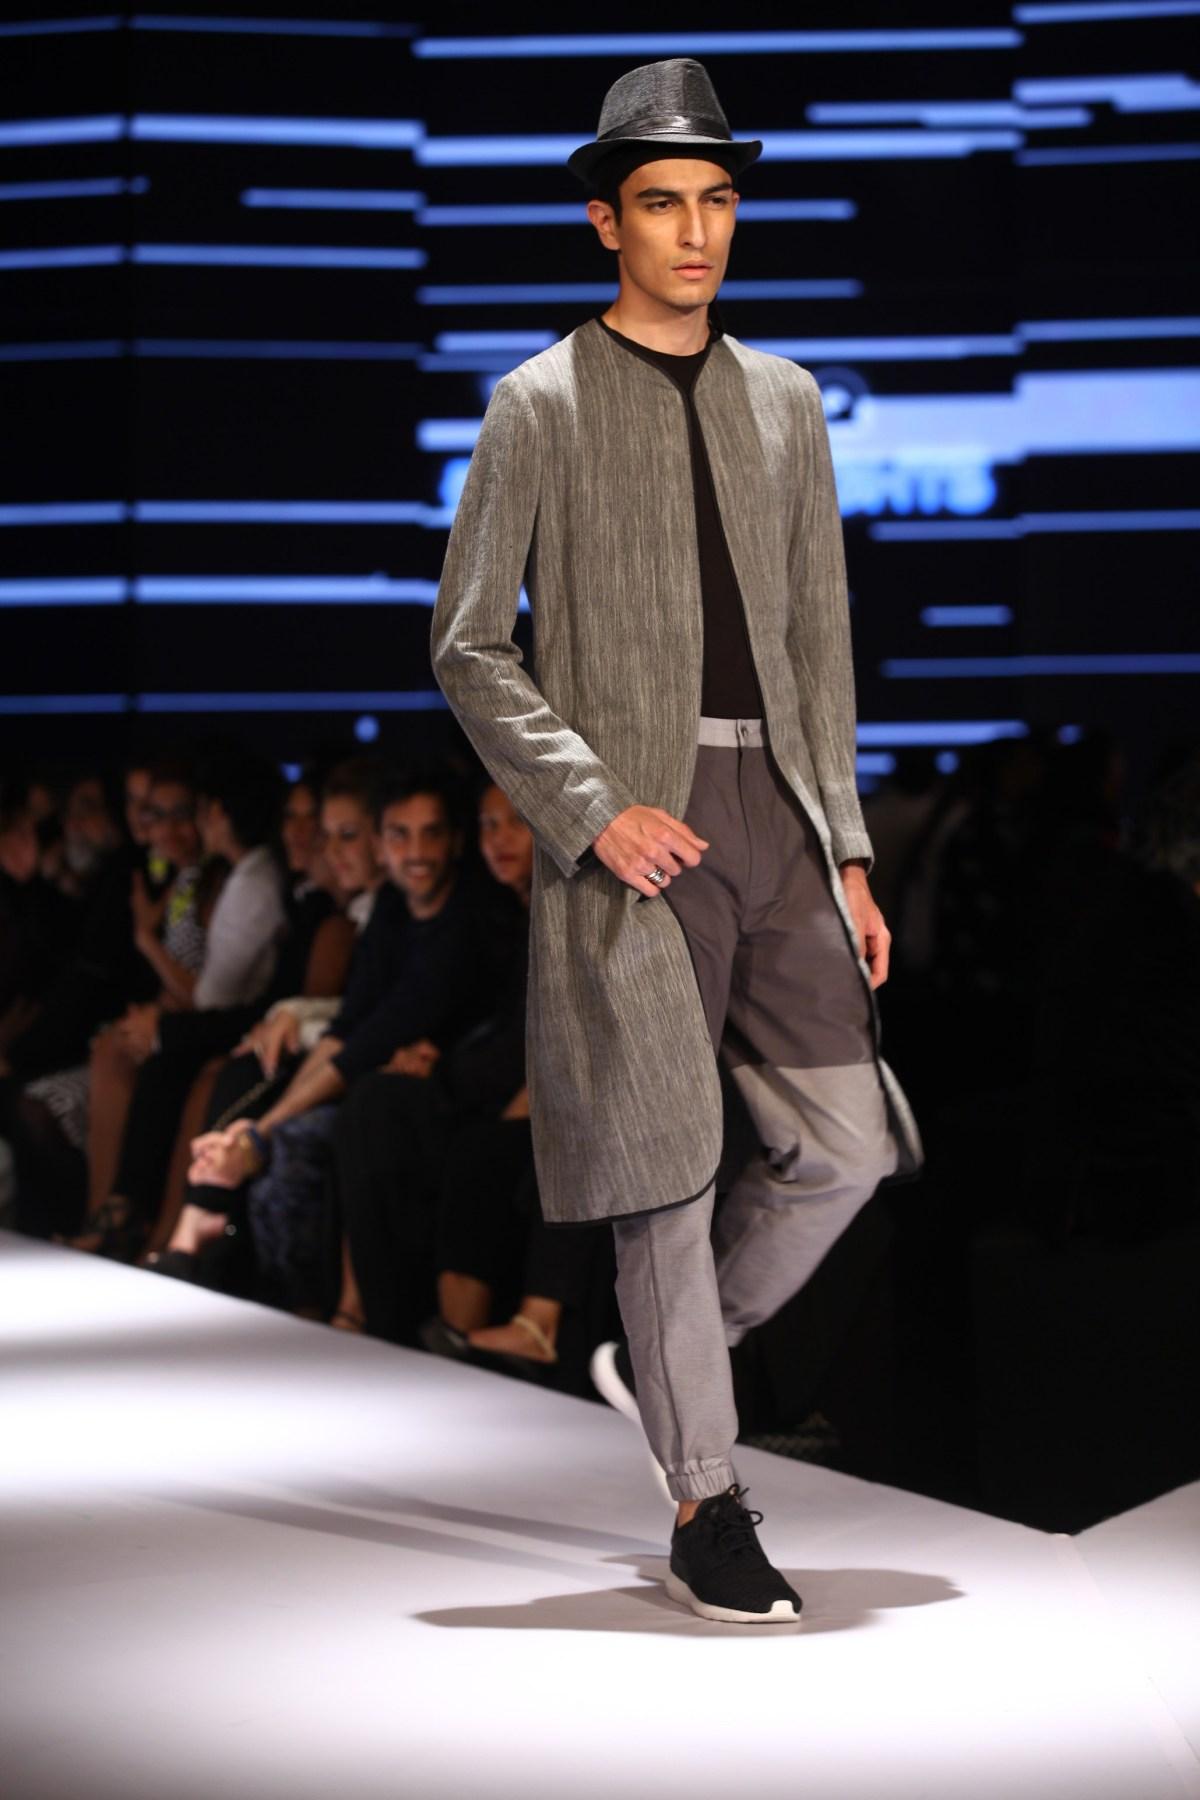 Model in Ujjawal Dubey on Day 2 of Van Heusen + GQ Fashion Nights (4)